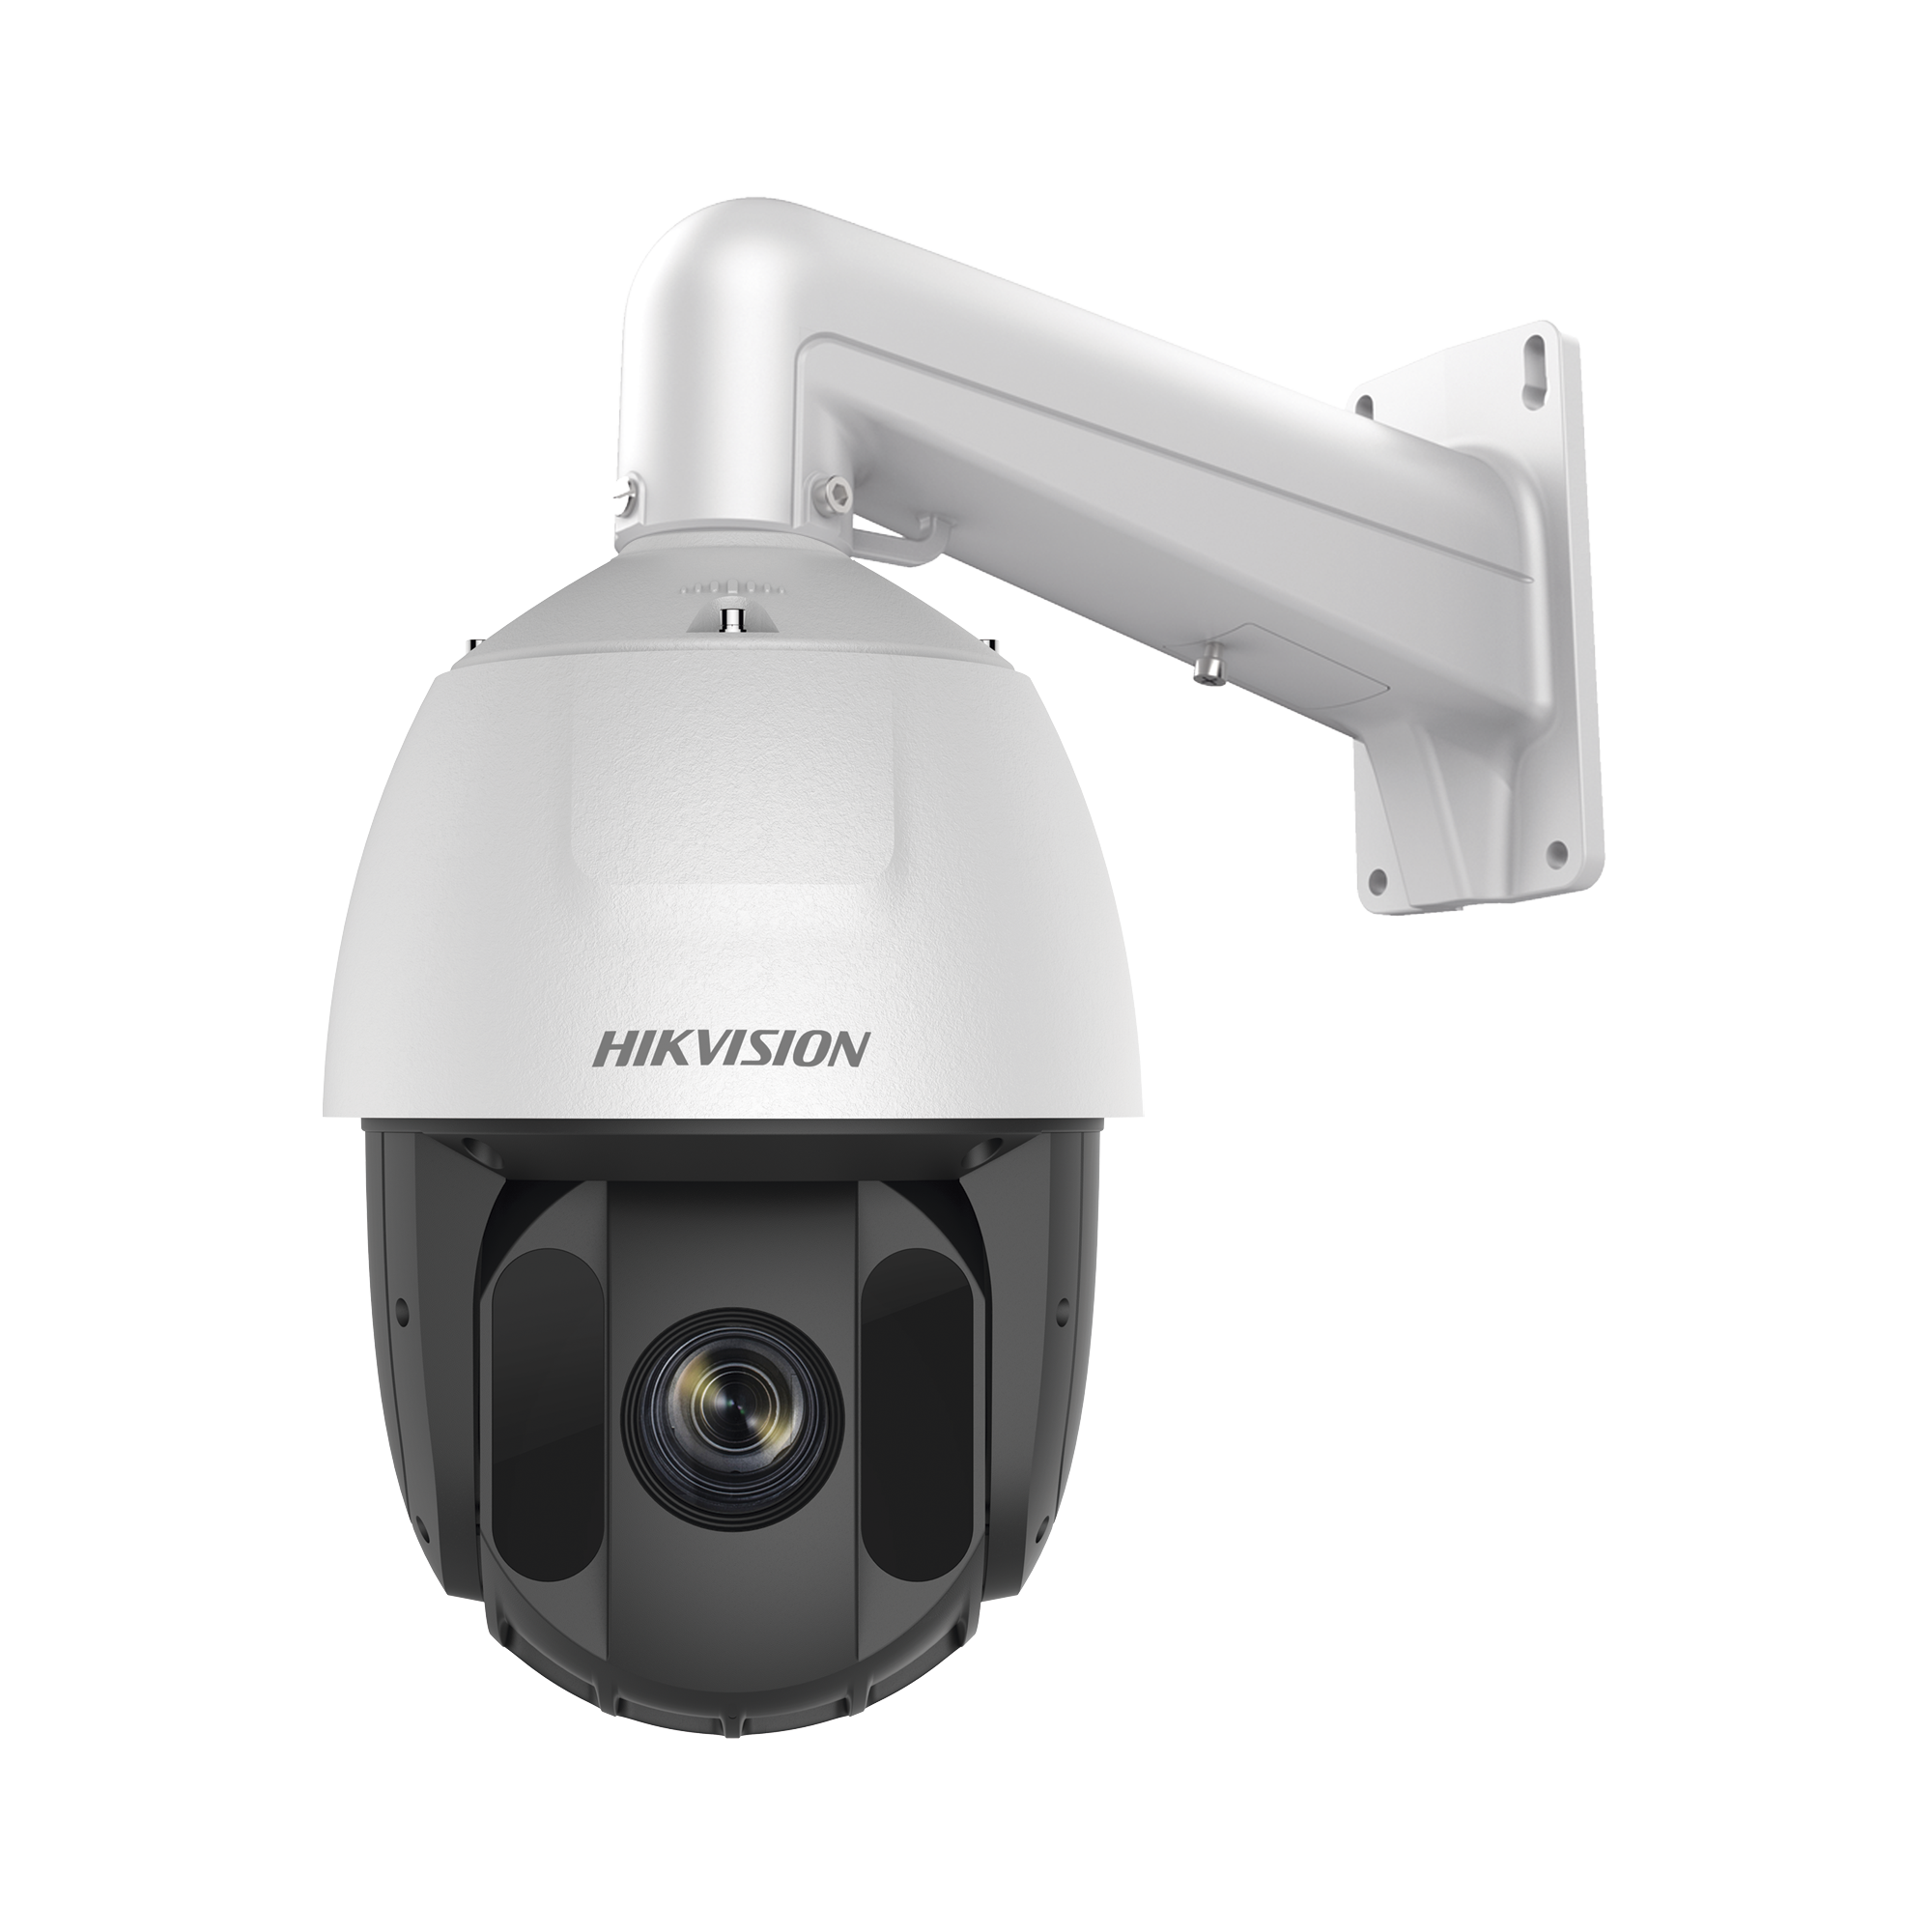 Domo PTZ TURBOHD 2 Megapixel (1080P) / 32X Zoom / 150 mts IR / Exterior IP66 / WDR 120 dB / Ultra Baja Iluminación / Entrada y Salida de Alarmas